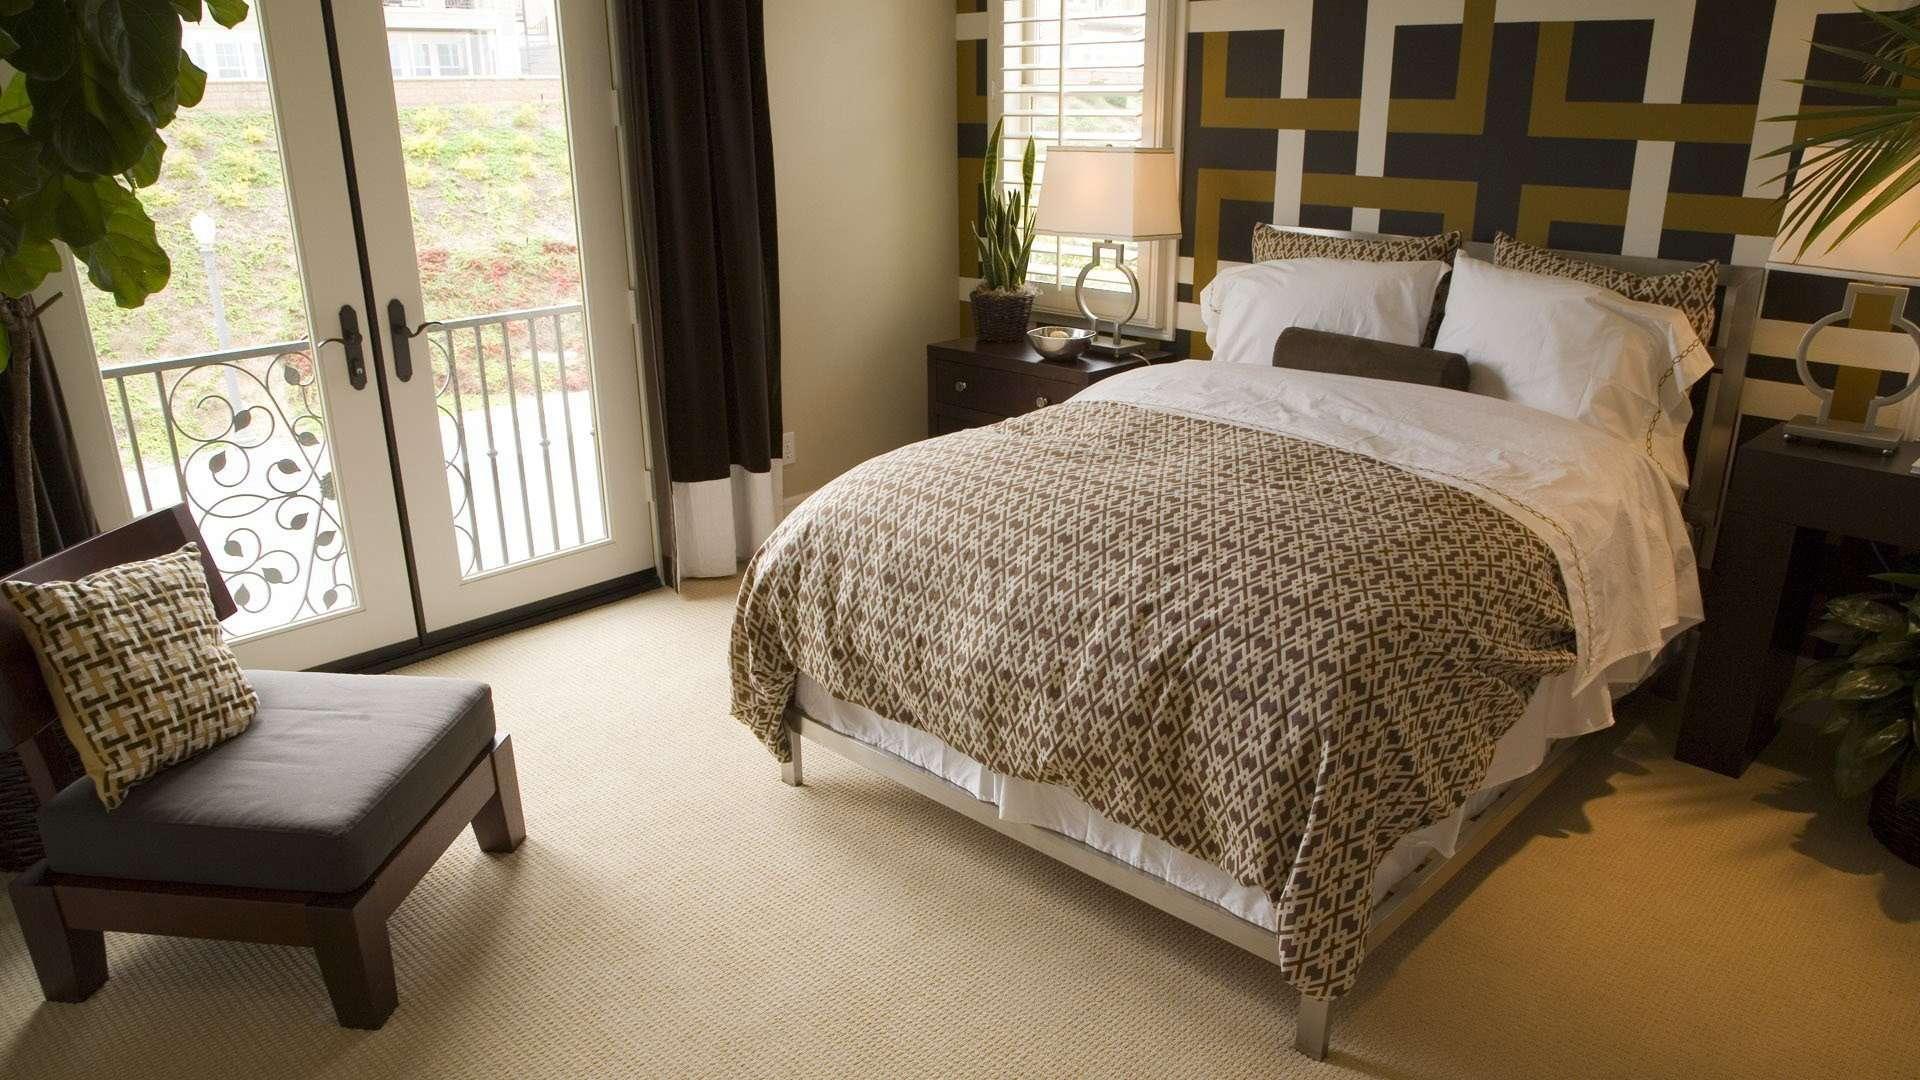 odfx مجموعة صور لديكورات غرف نوم 2014 حديثة ومودرن و تركيةوكلاسيكية من أحدث وأجمل وأفخم تشكيلة ديكورات غرف نوم 2014